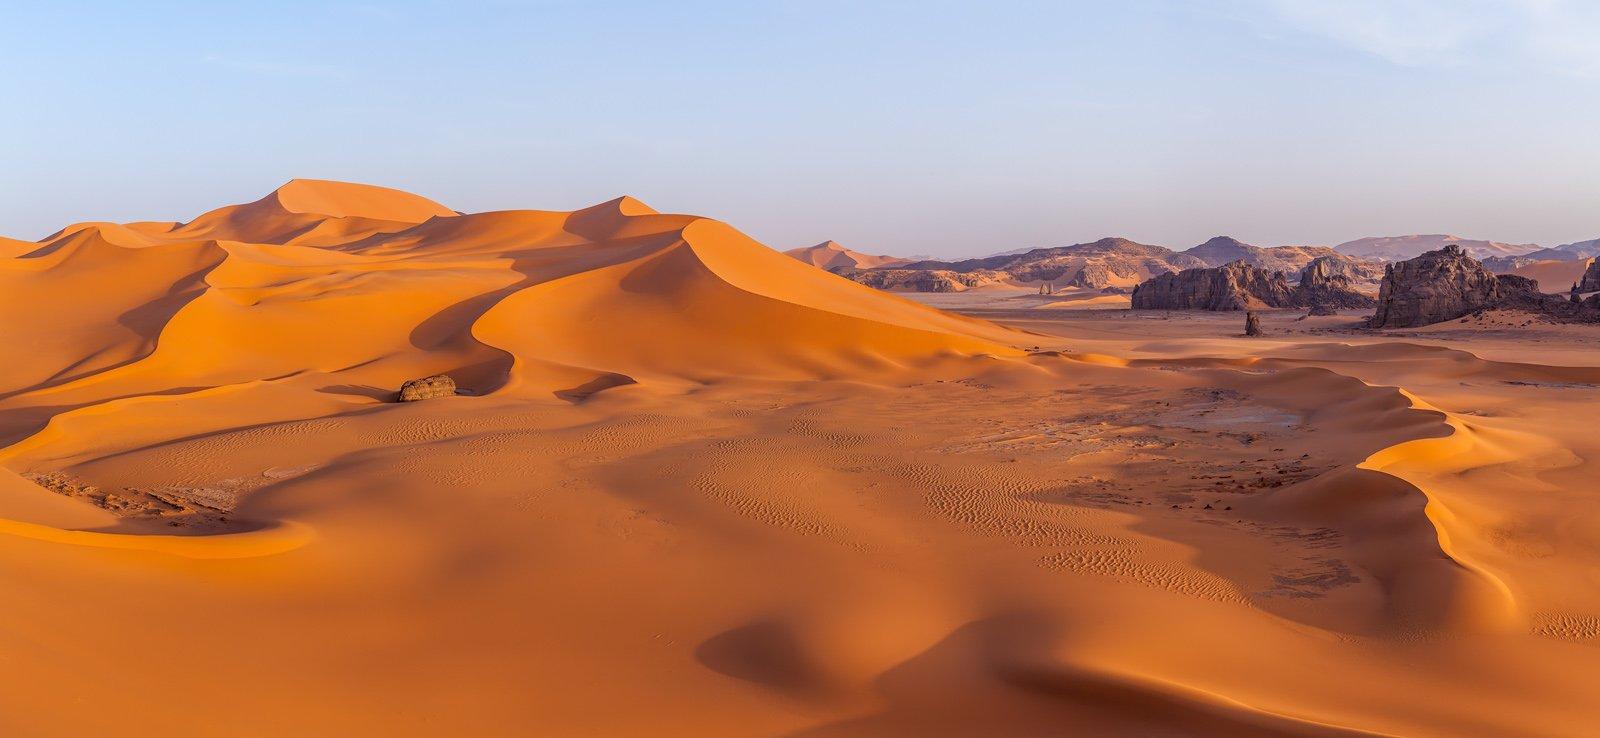 Сахара, Тадрарт, Алжир, дюна, барханы, пустыня, Африка, Арсений Кашкаров